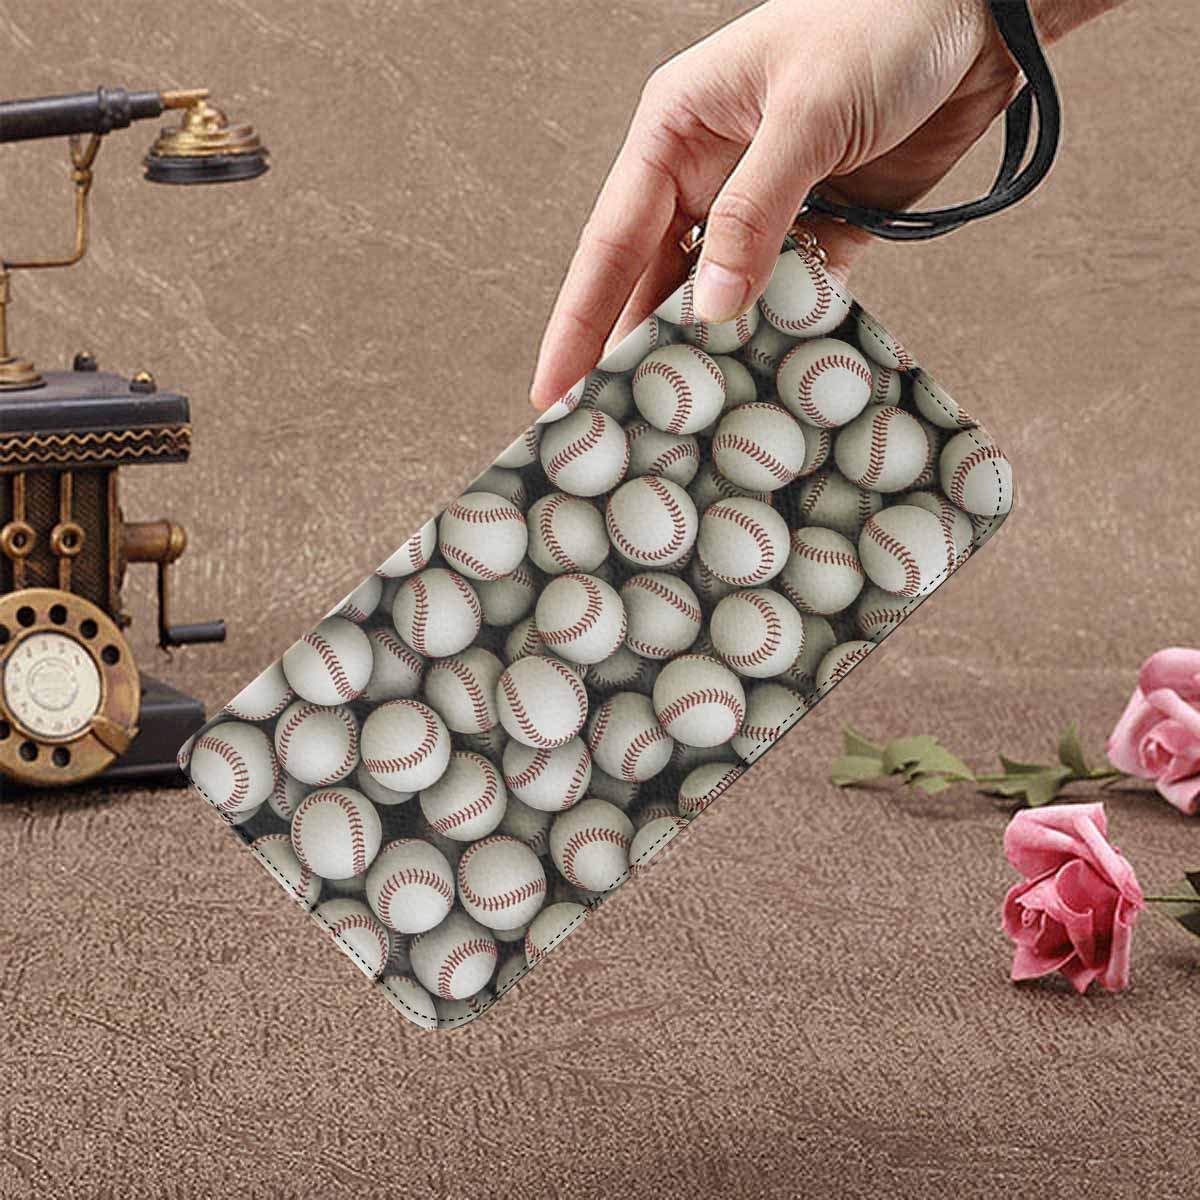 InterestPrint Womens a Big Ball Clutch Purse Card Holder Organizer Ladies Purse